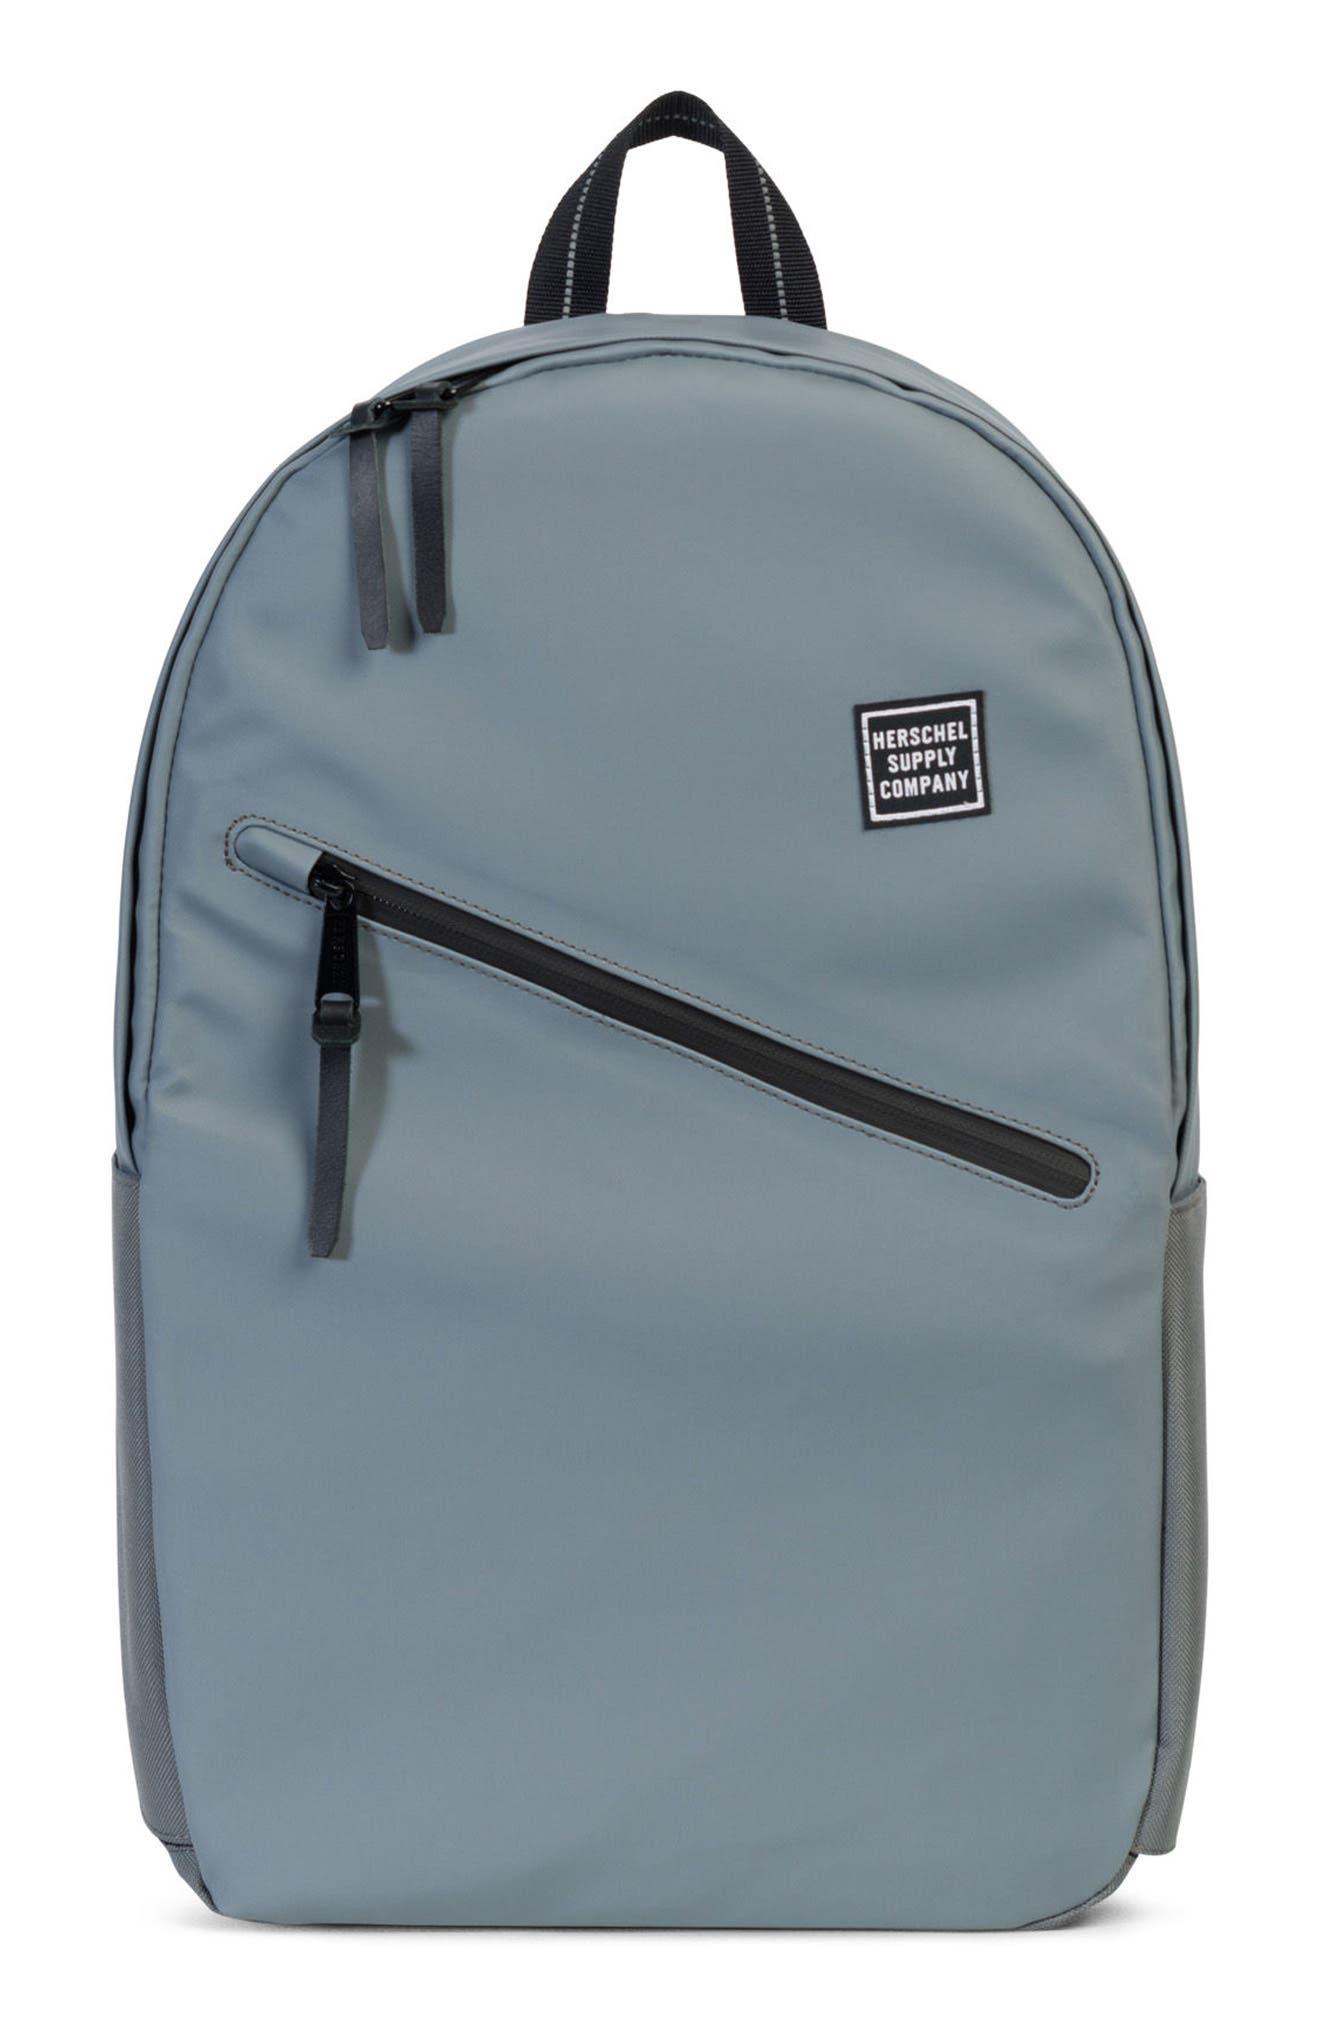 Alternate Image 1 Selected - Herschel Supply Co. Parker Studio Collection Backpack